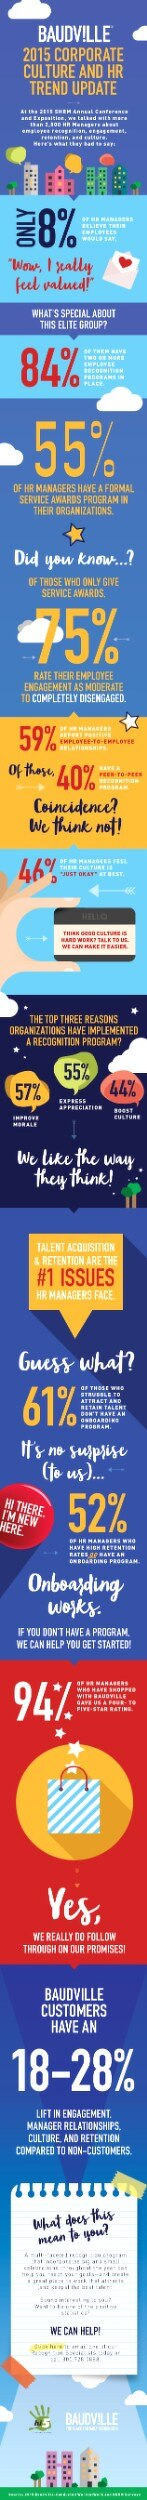 2015 Corporate Culture & HR Trends